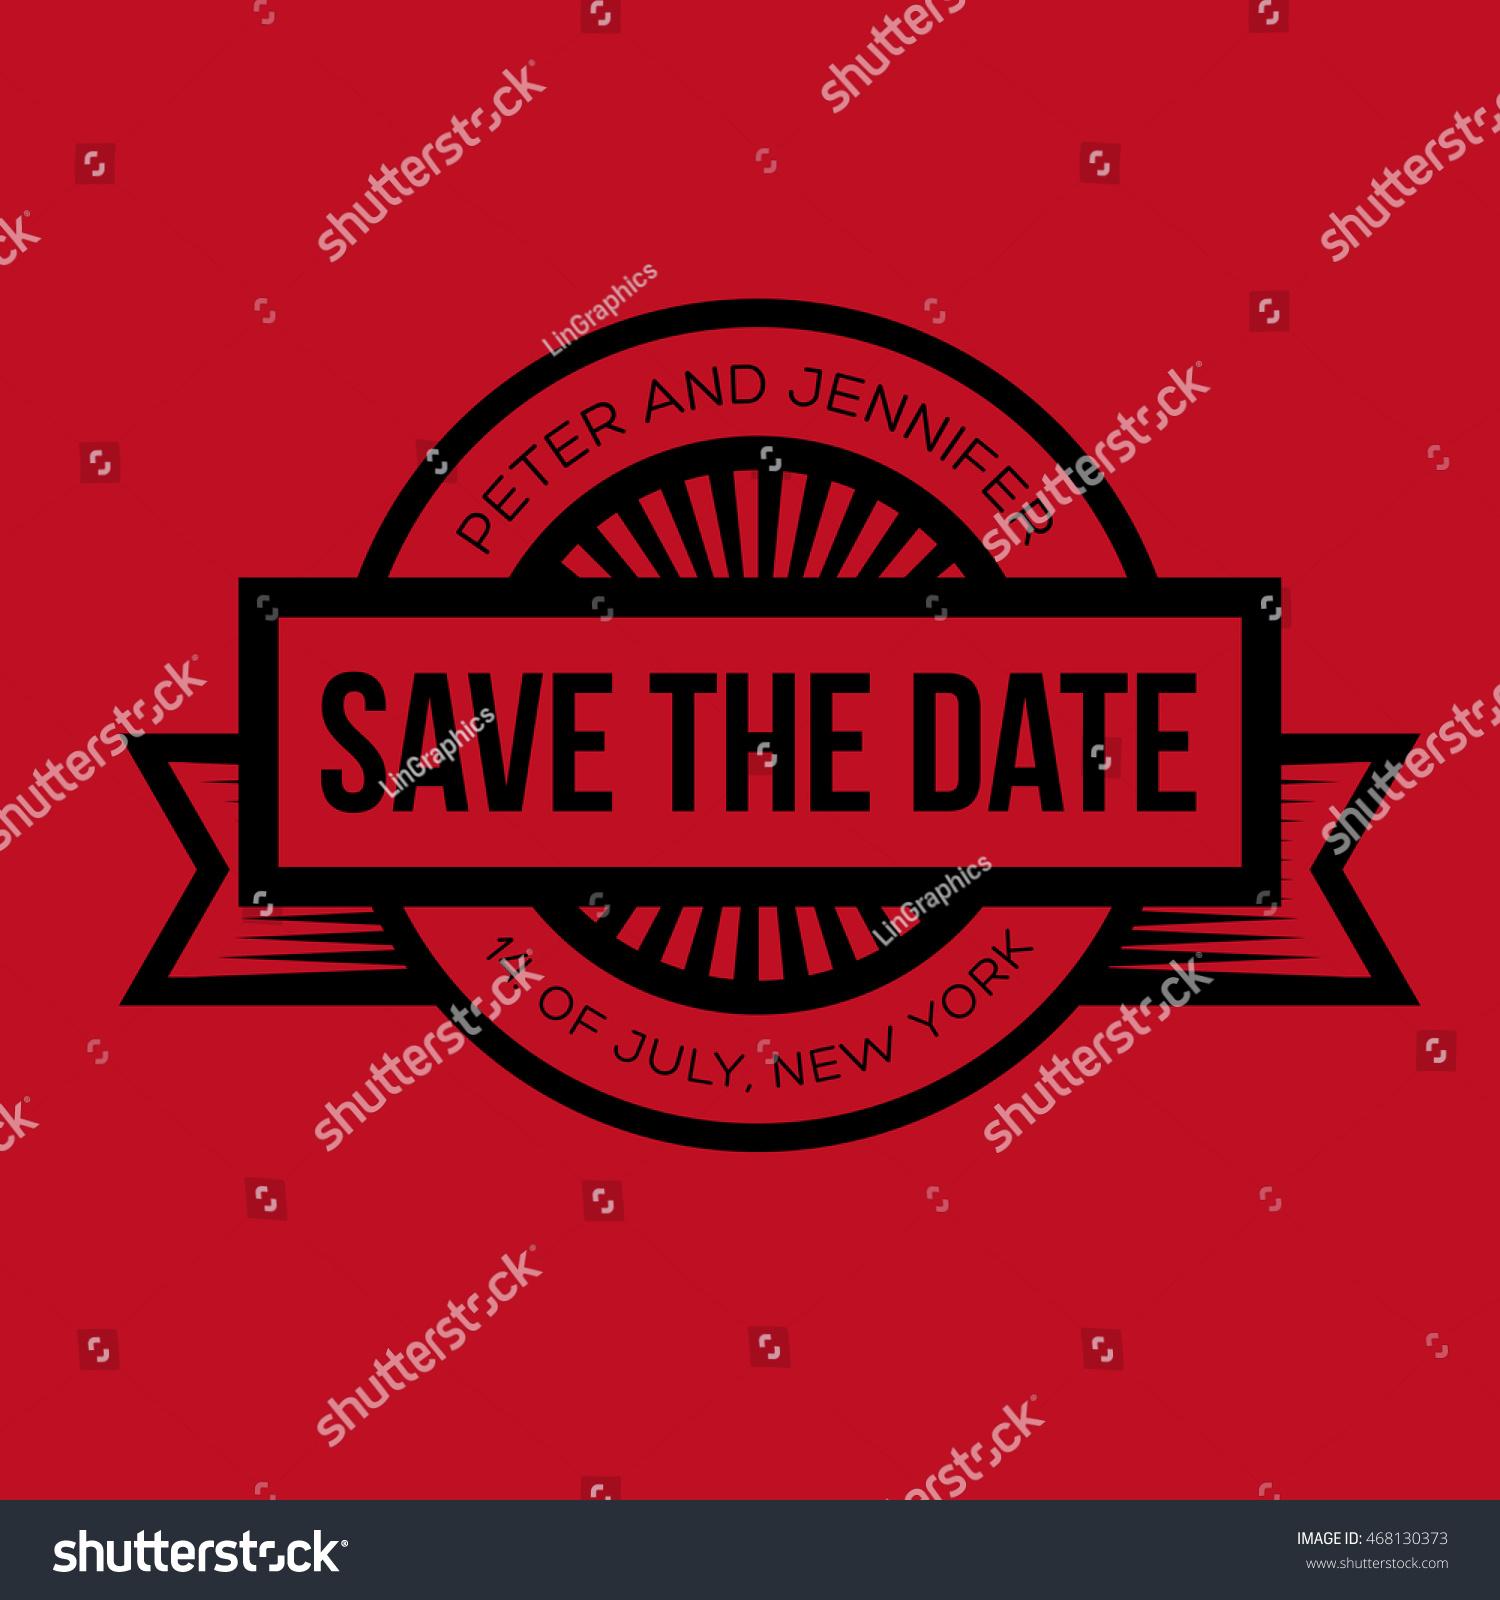 Save Date Retro Wedding Invitation Stock Vector 468130373 - Shutterstock